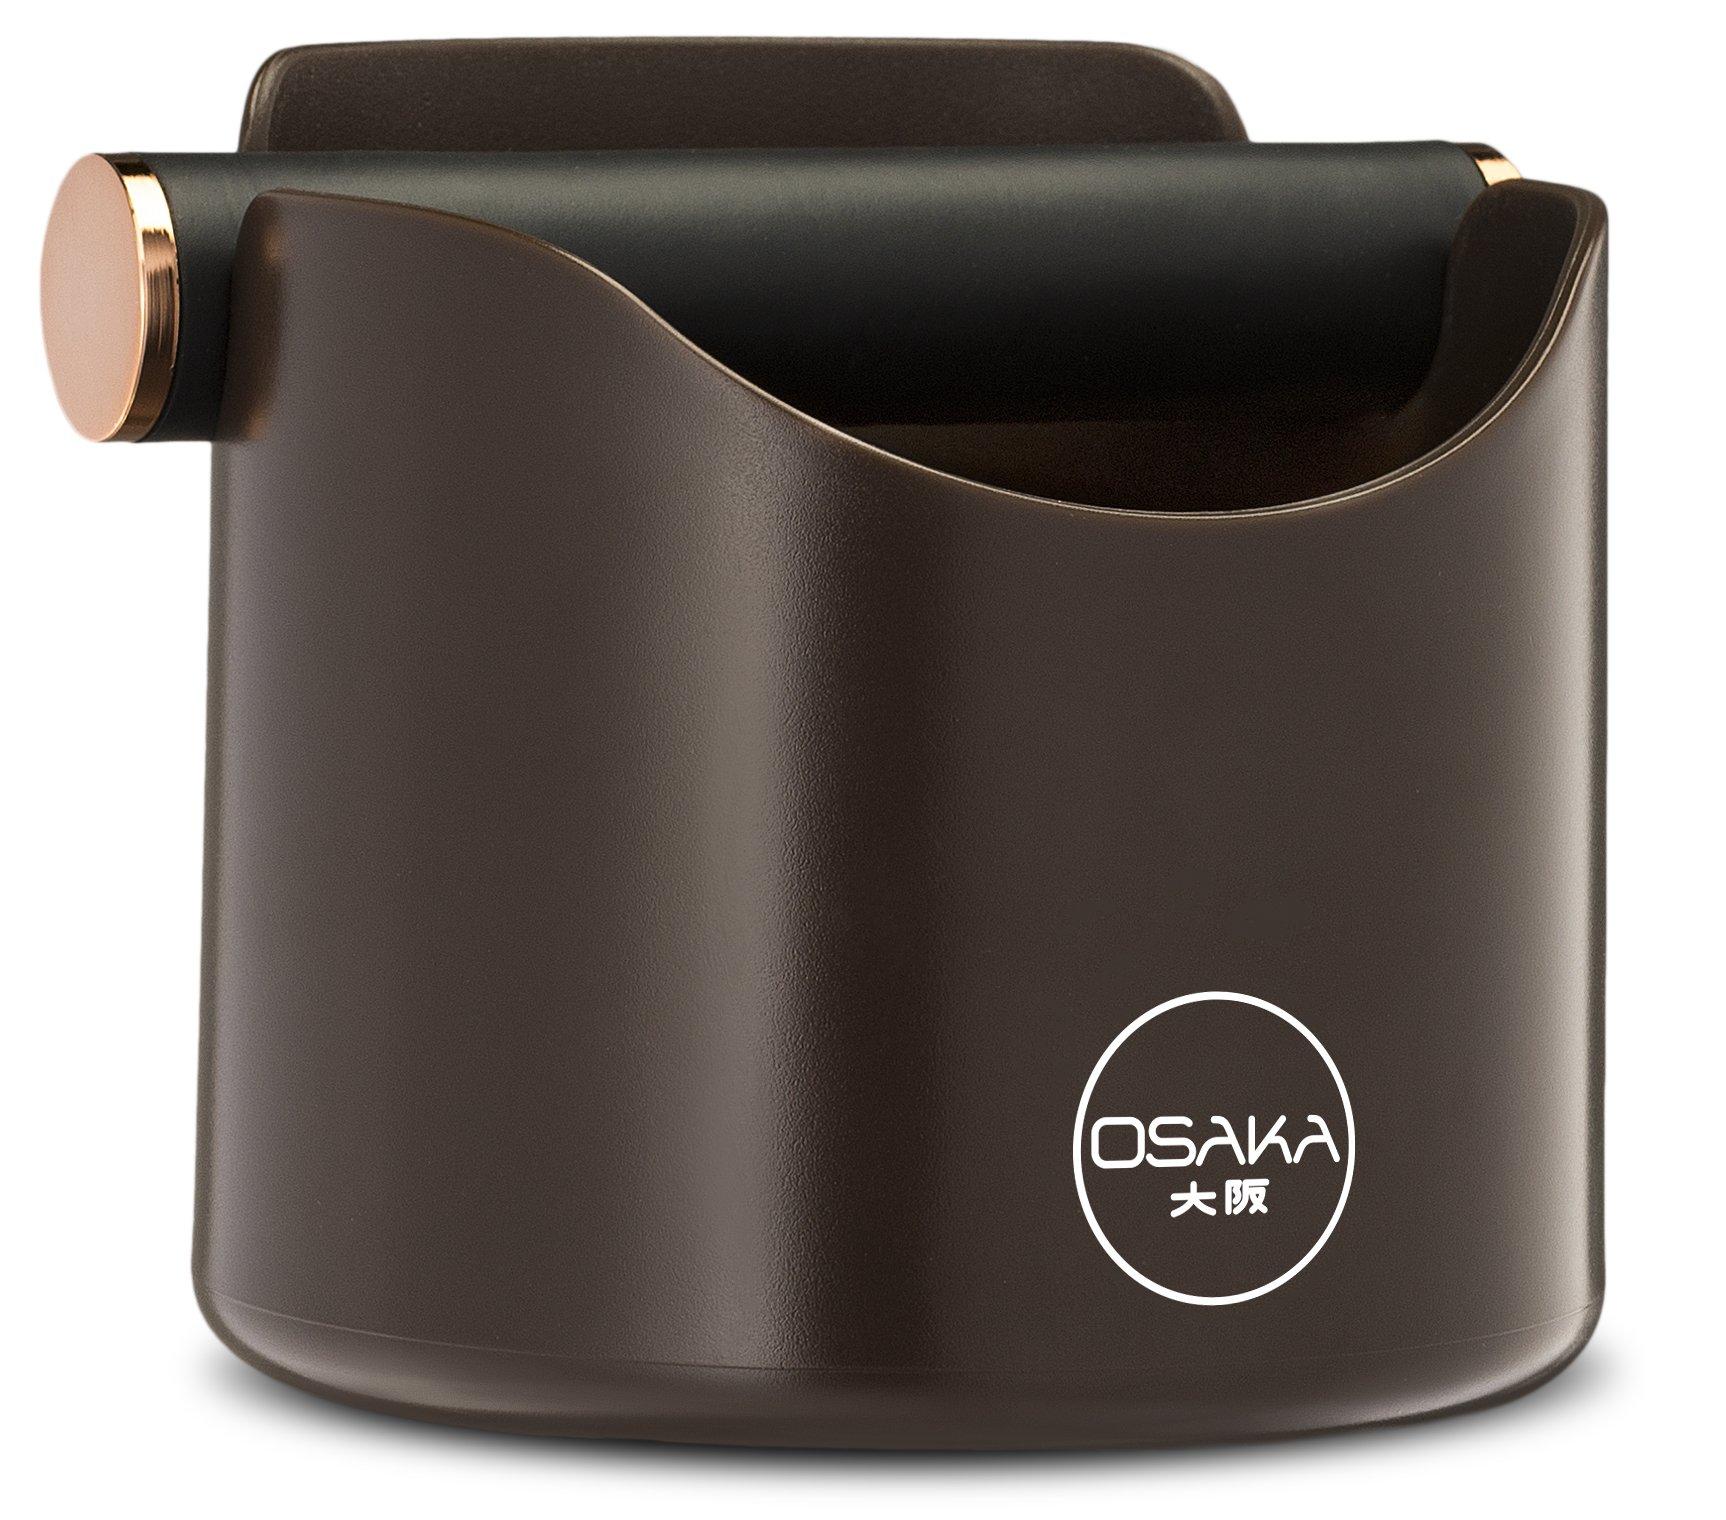 Osaka, Shock-Absorbent Espresso Knock Box - Durable 4.7 Inch Barista Style Knockbox''Kawachi Fuji Garden'' (Brown)